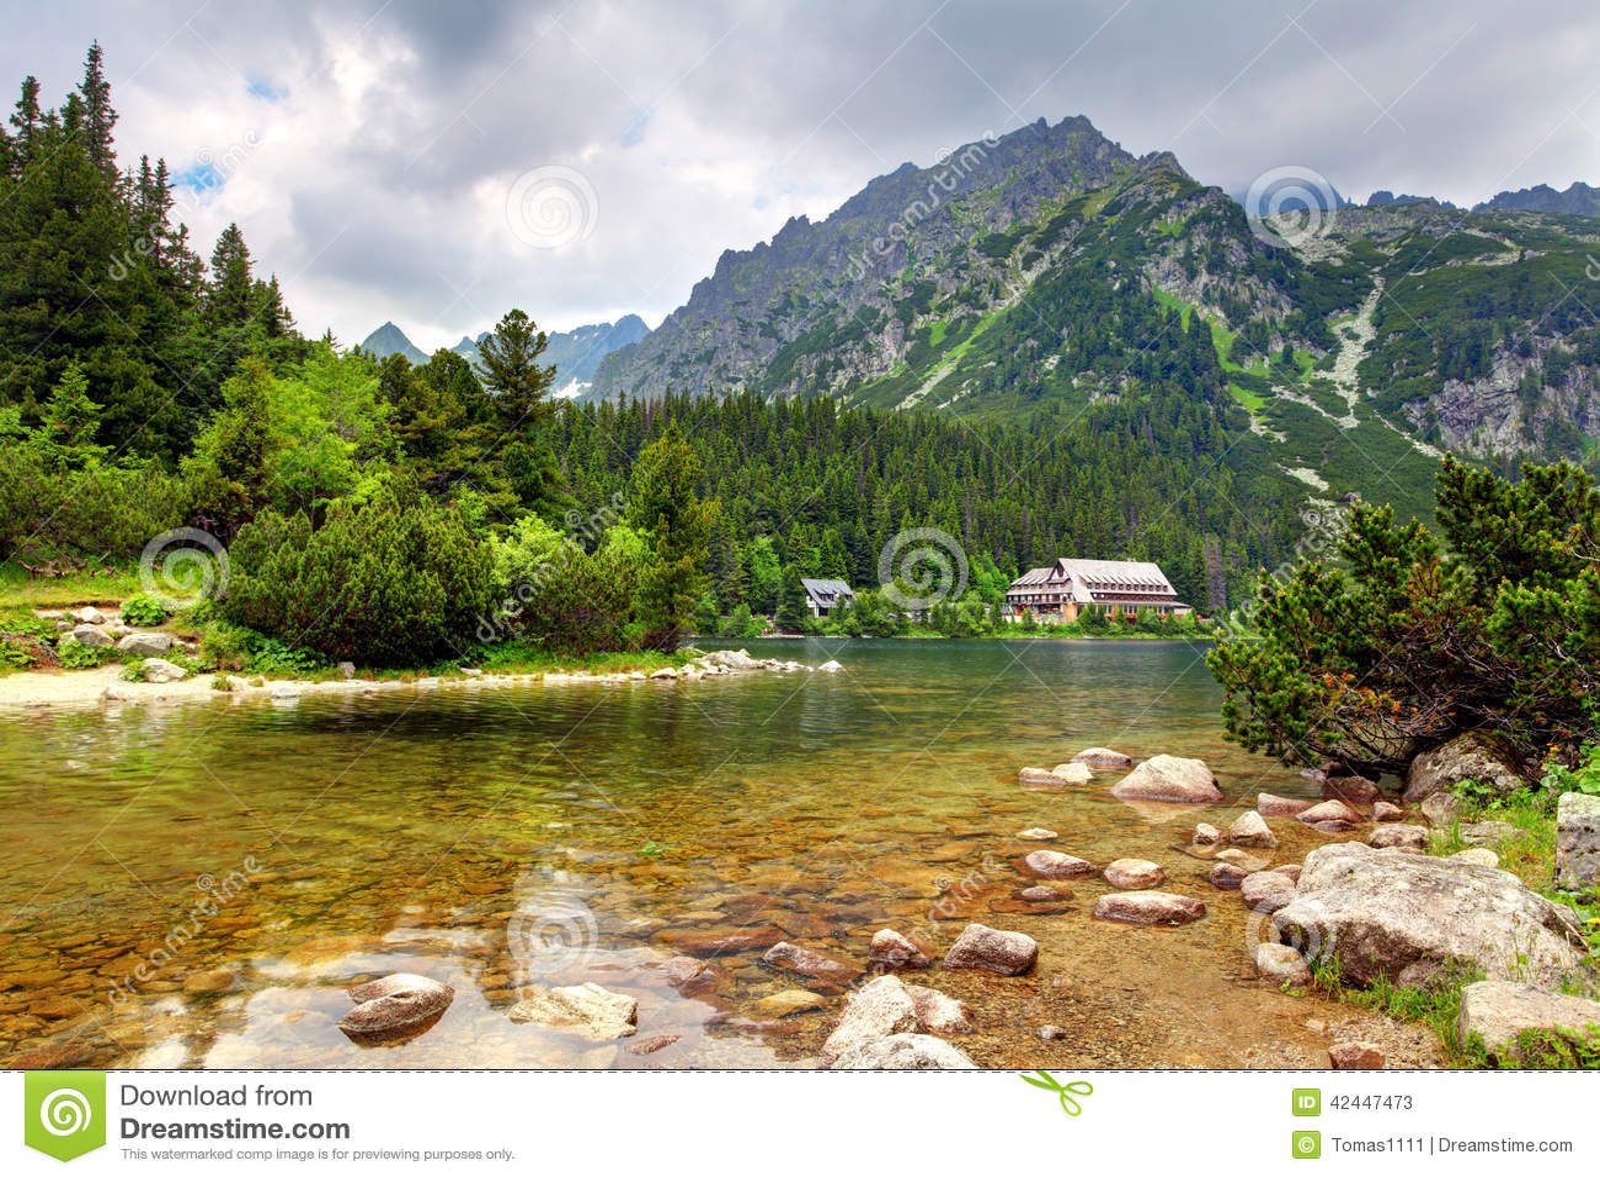 Schone Berglandschaft Im Sommer In Den Alpen, Die Schweiz ...